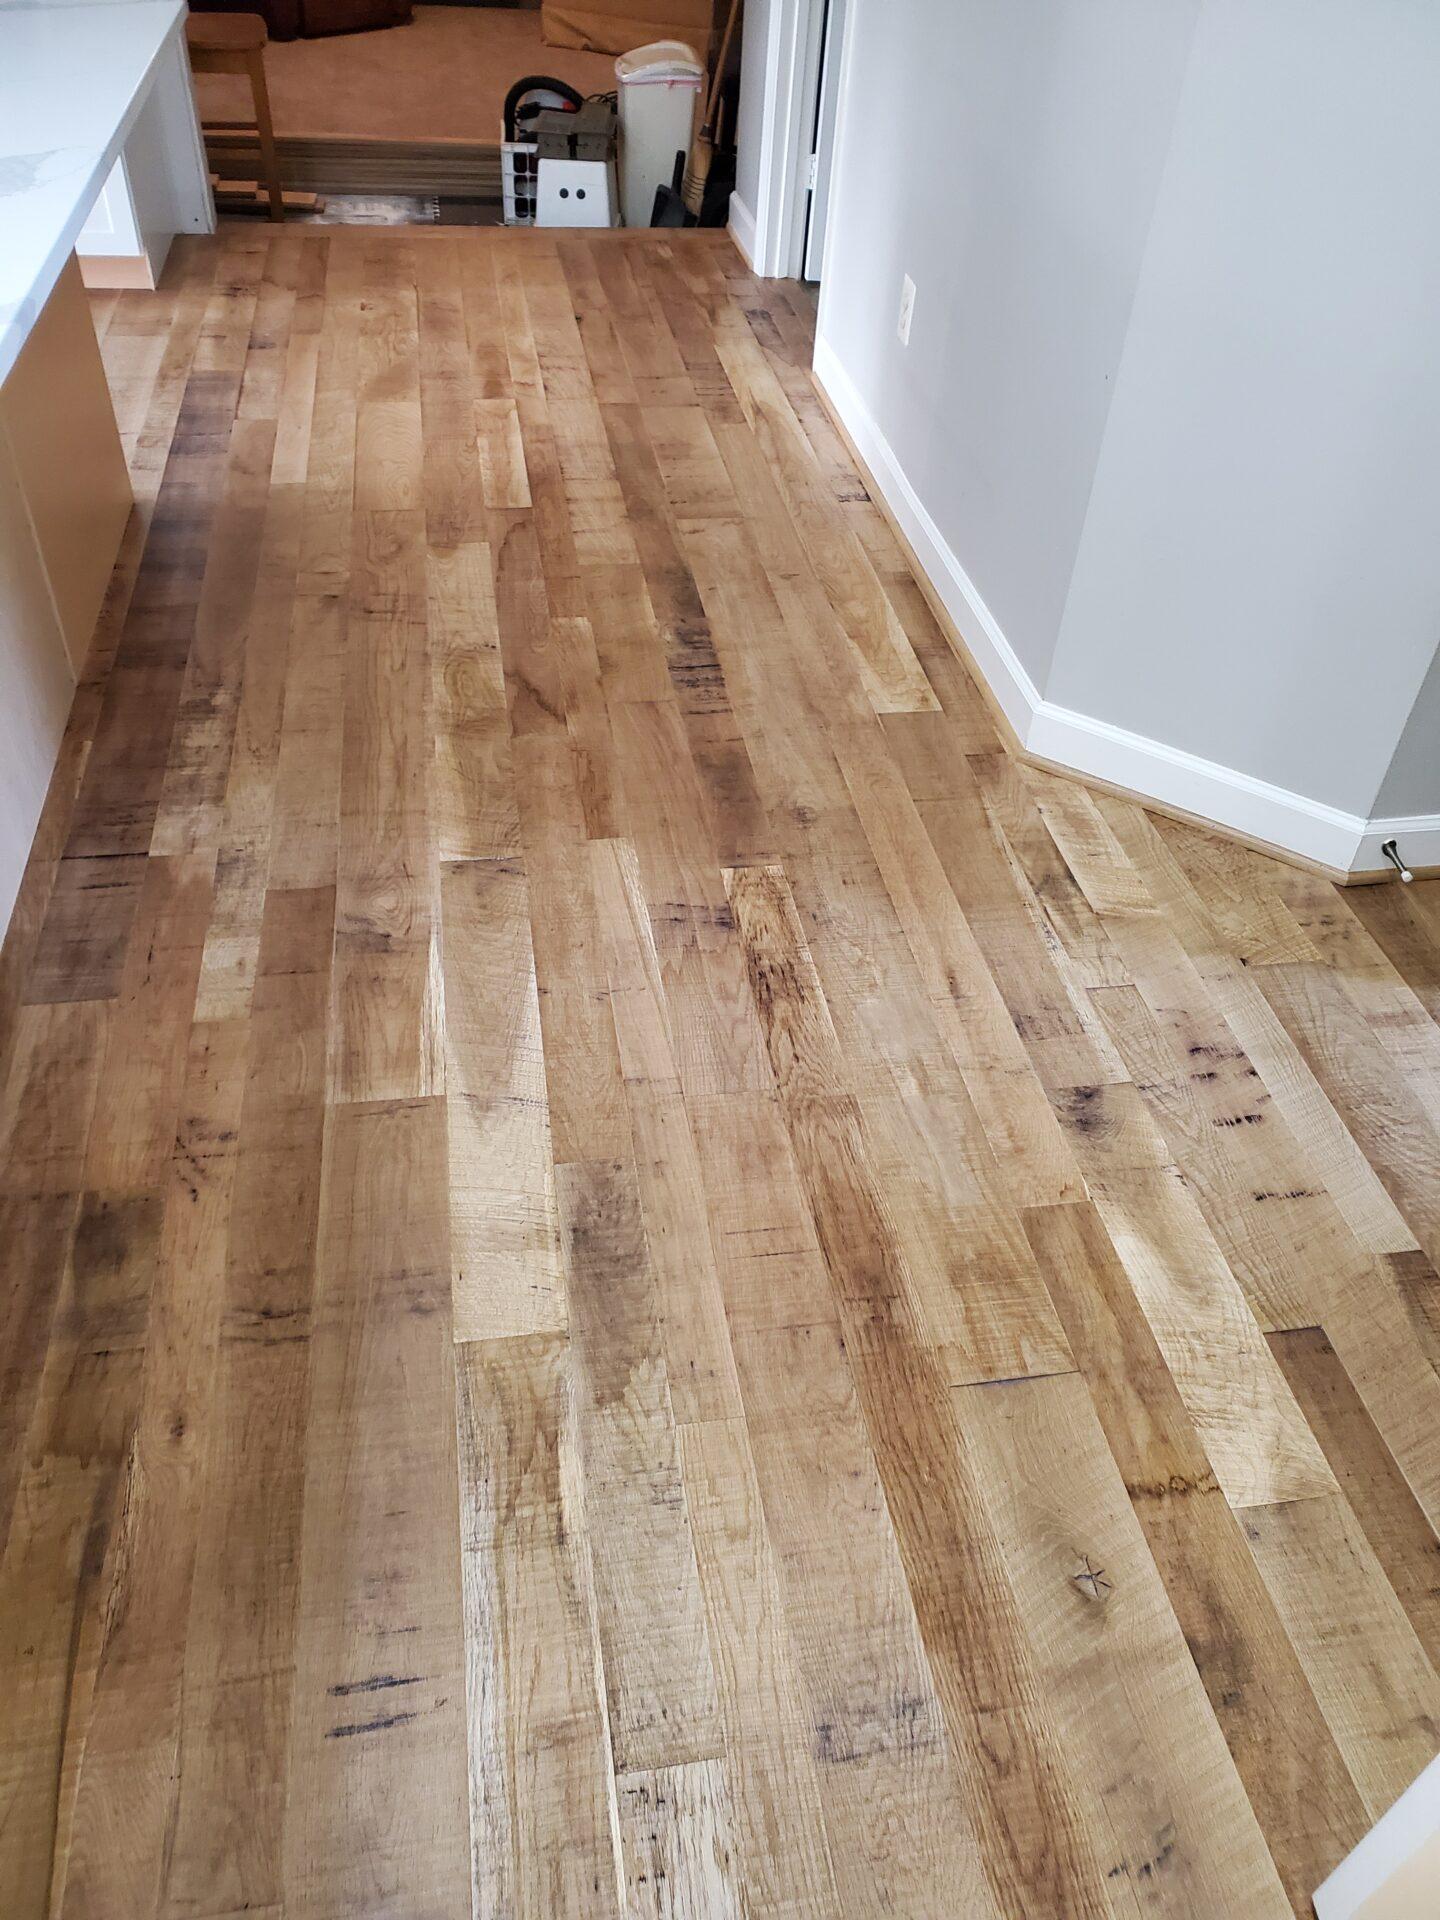 Rustic Whiskey Springs White Oak Flooring 3″-6″